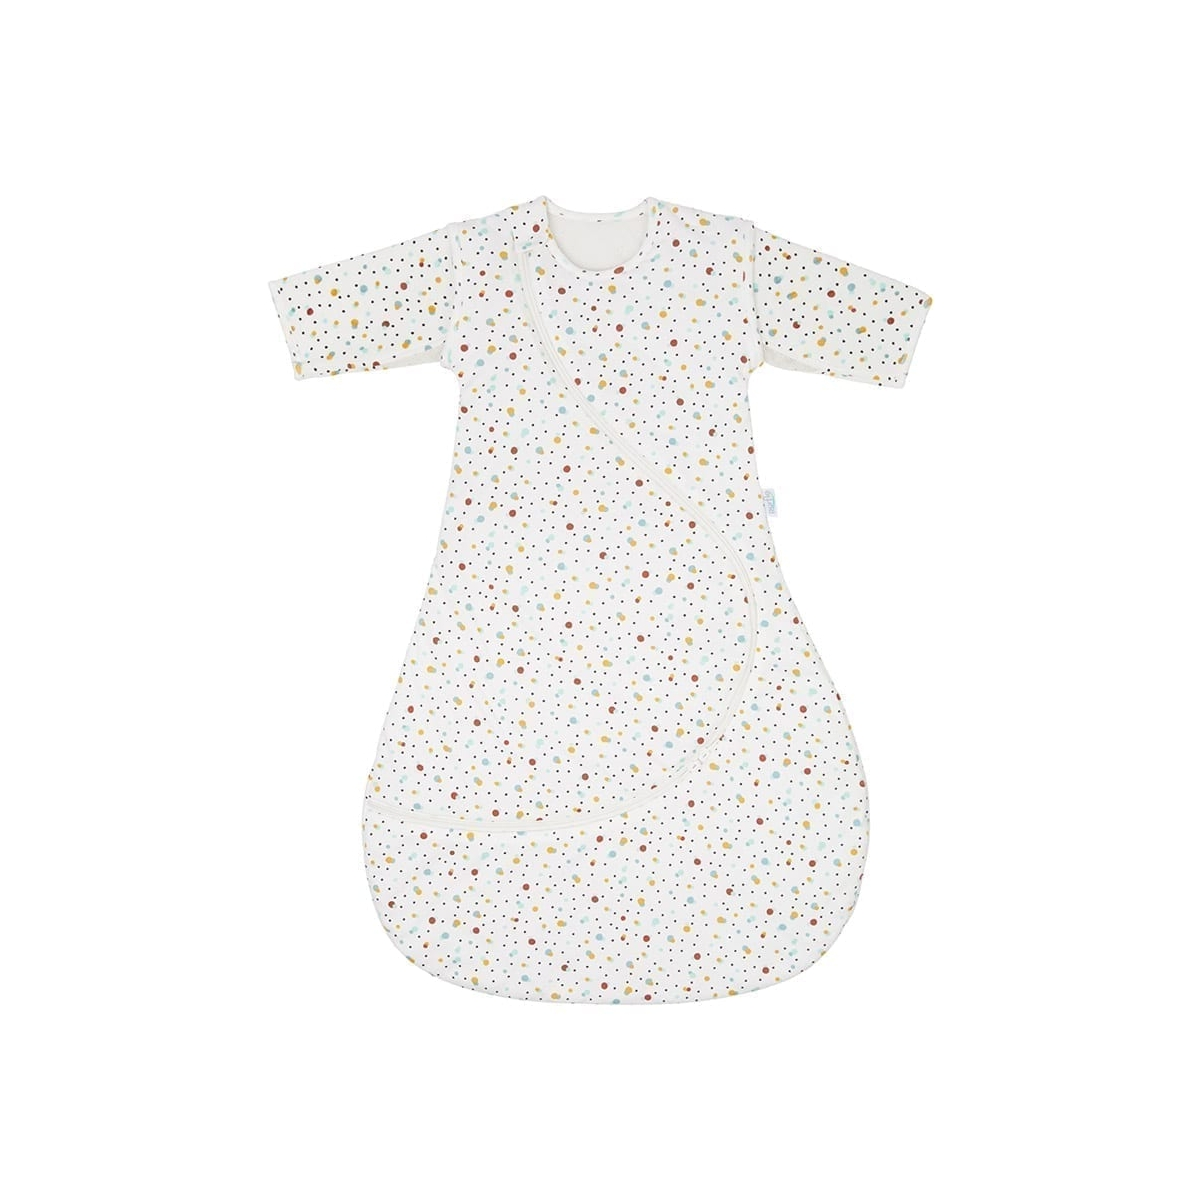 Purflo Baby Sleep Bag 2.5 Tog 3-9m-Scandi Spot (NEW)